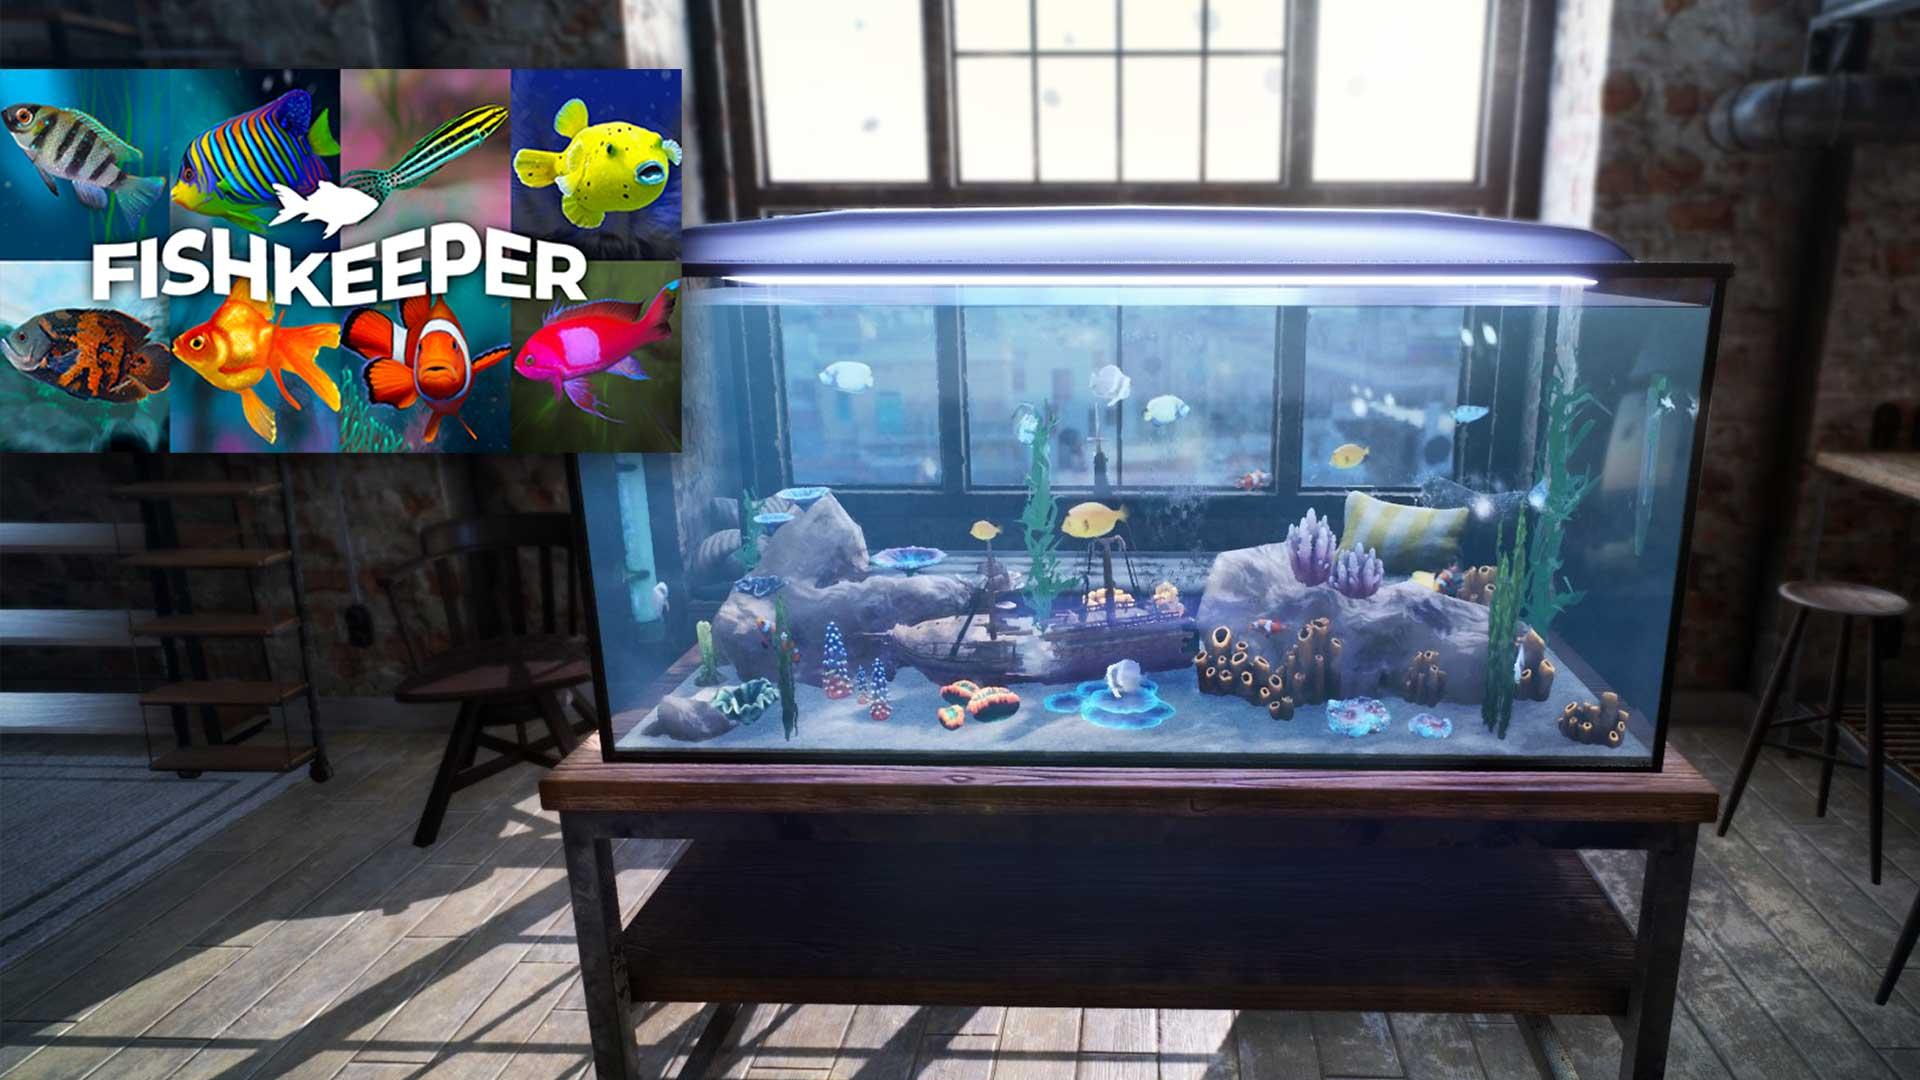 fishkeeper cover